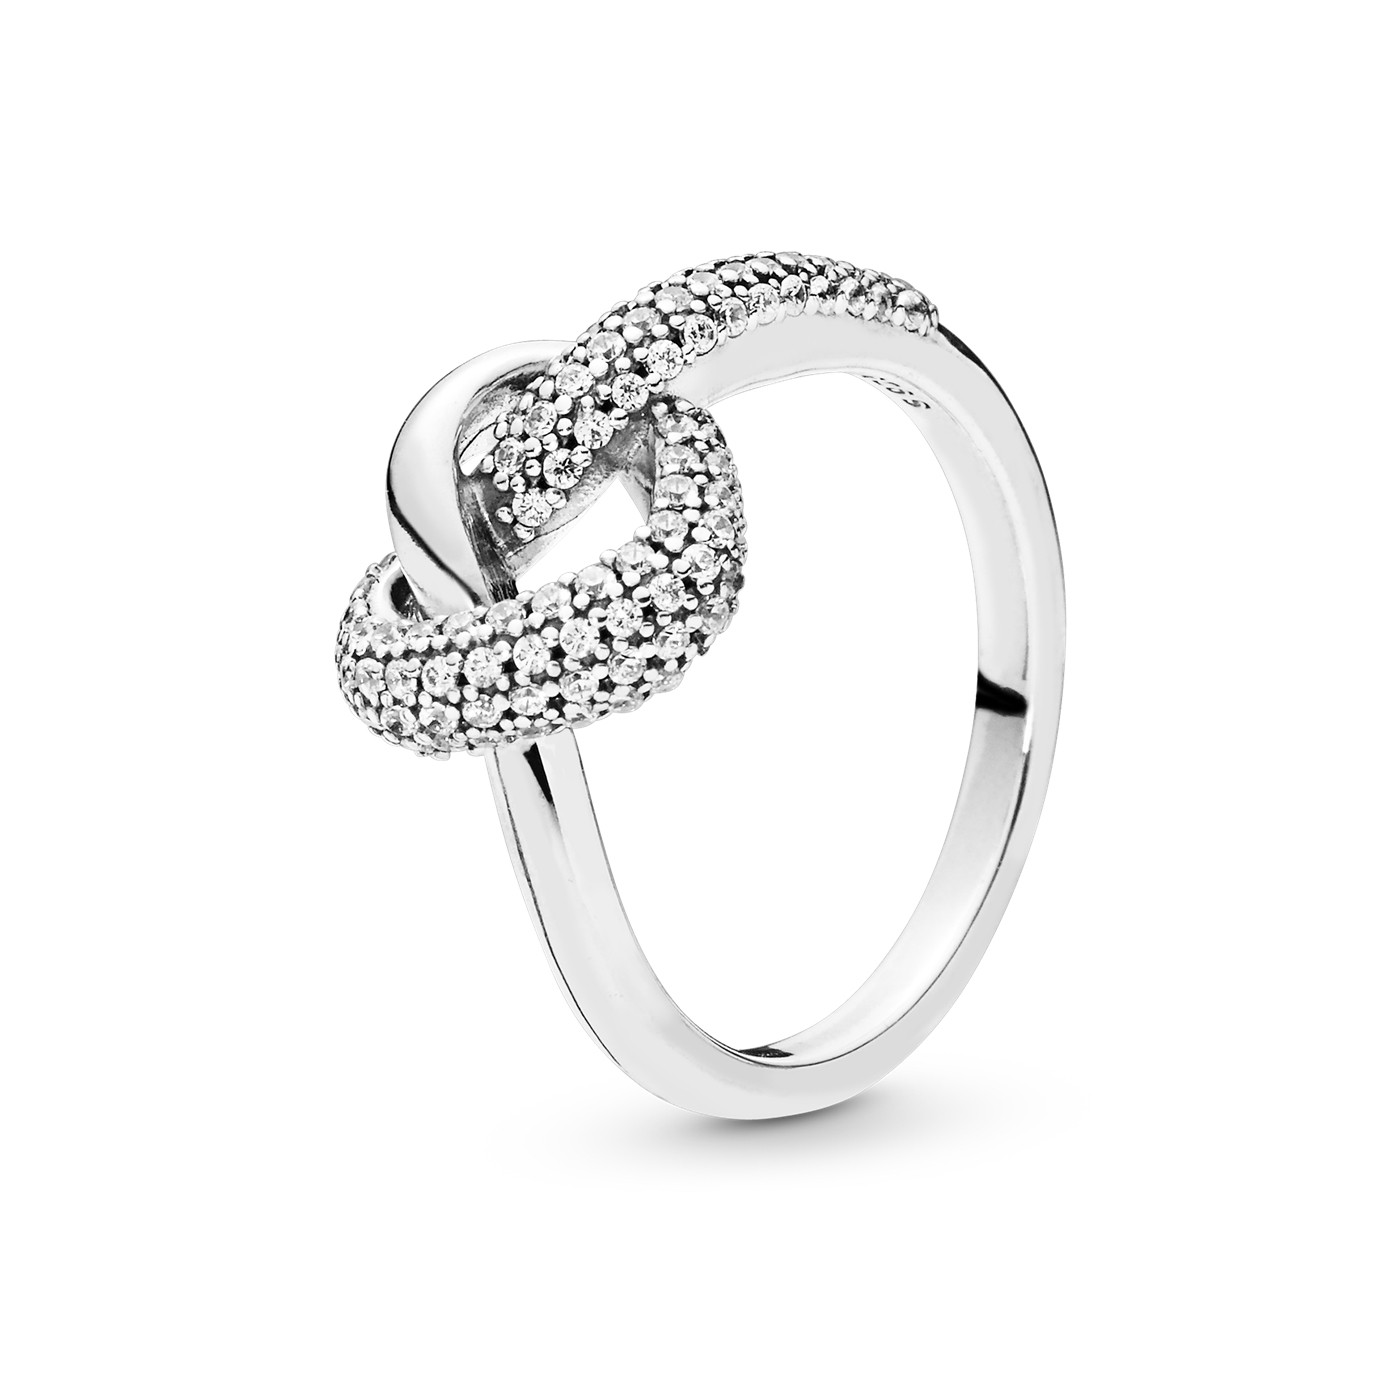 784d505a5 Pandora Stories Ring 198086CZ - Jewelry